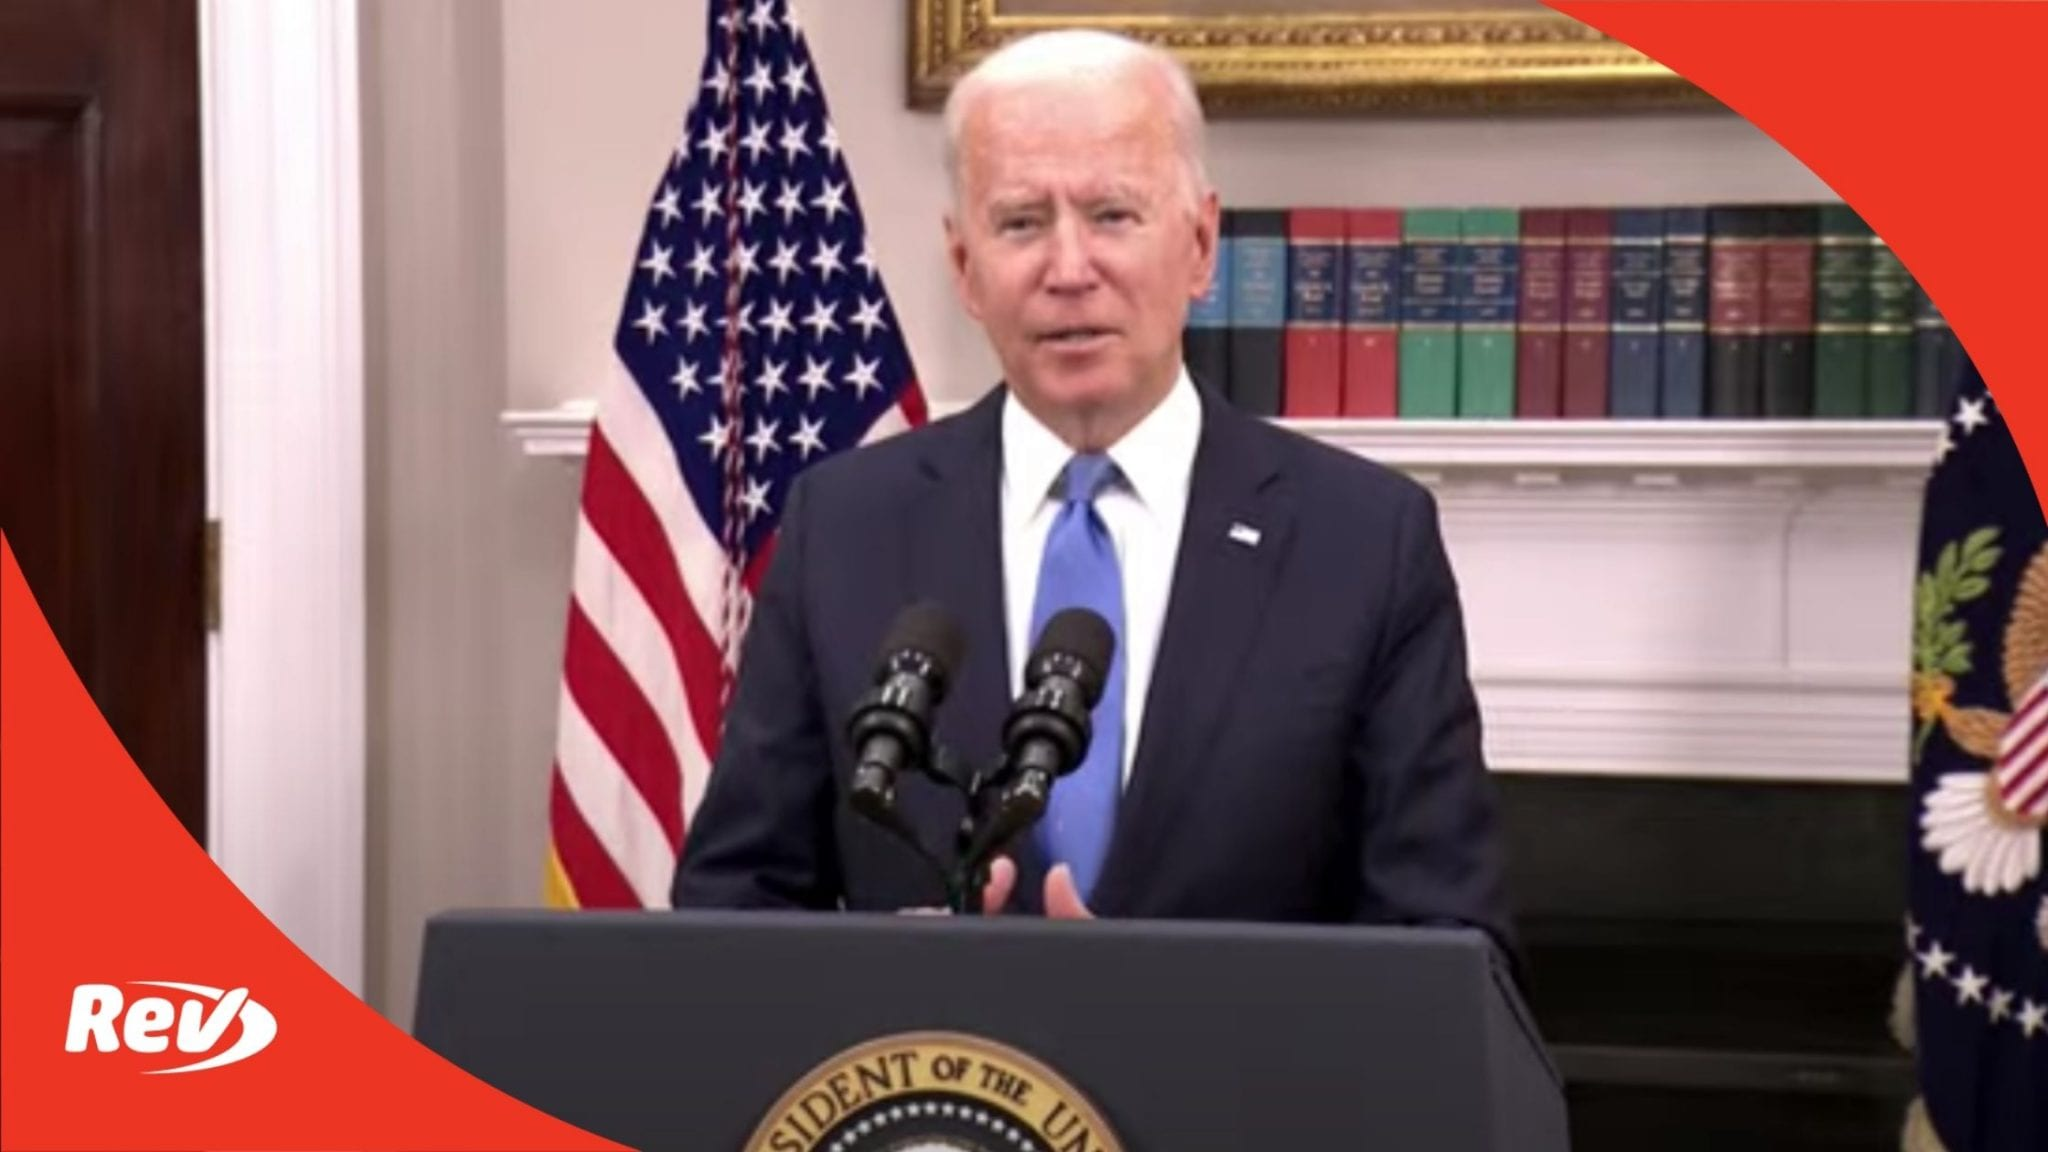 Joe Biden Colonial Pipeline Incident Briefing Speech Transcript May 13